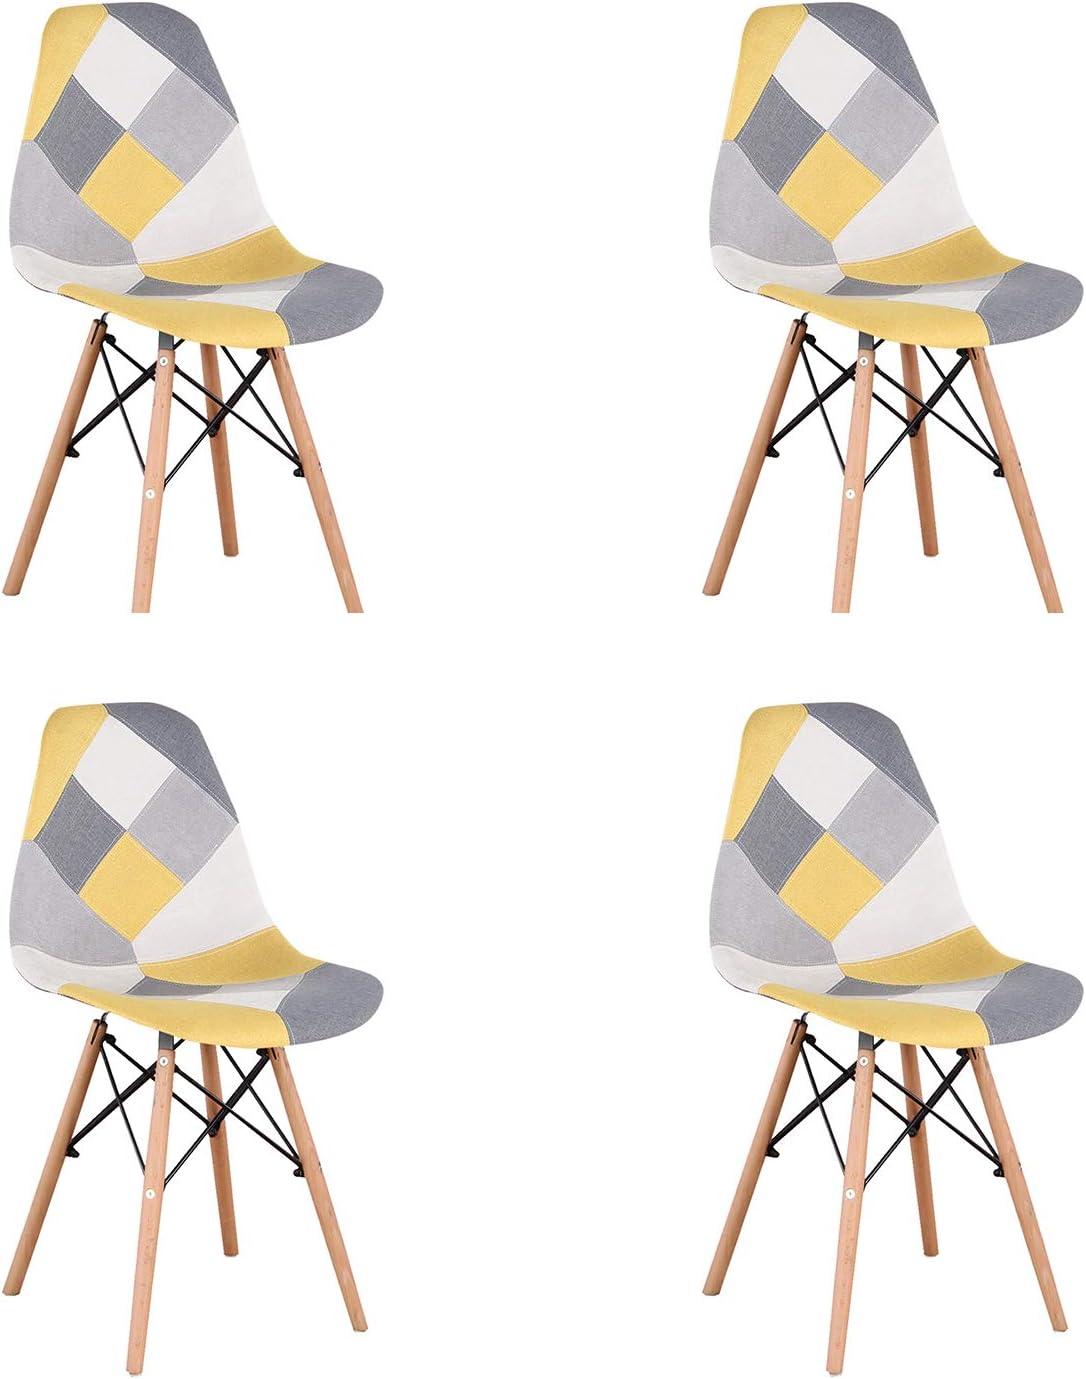 Un conjunto con 4 sillas de comedor hechas de patchwork moderno en estilo nórdico tapizado con tela de patchwork y silla de marco de madera en estilo escandinavo (amarillo)